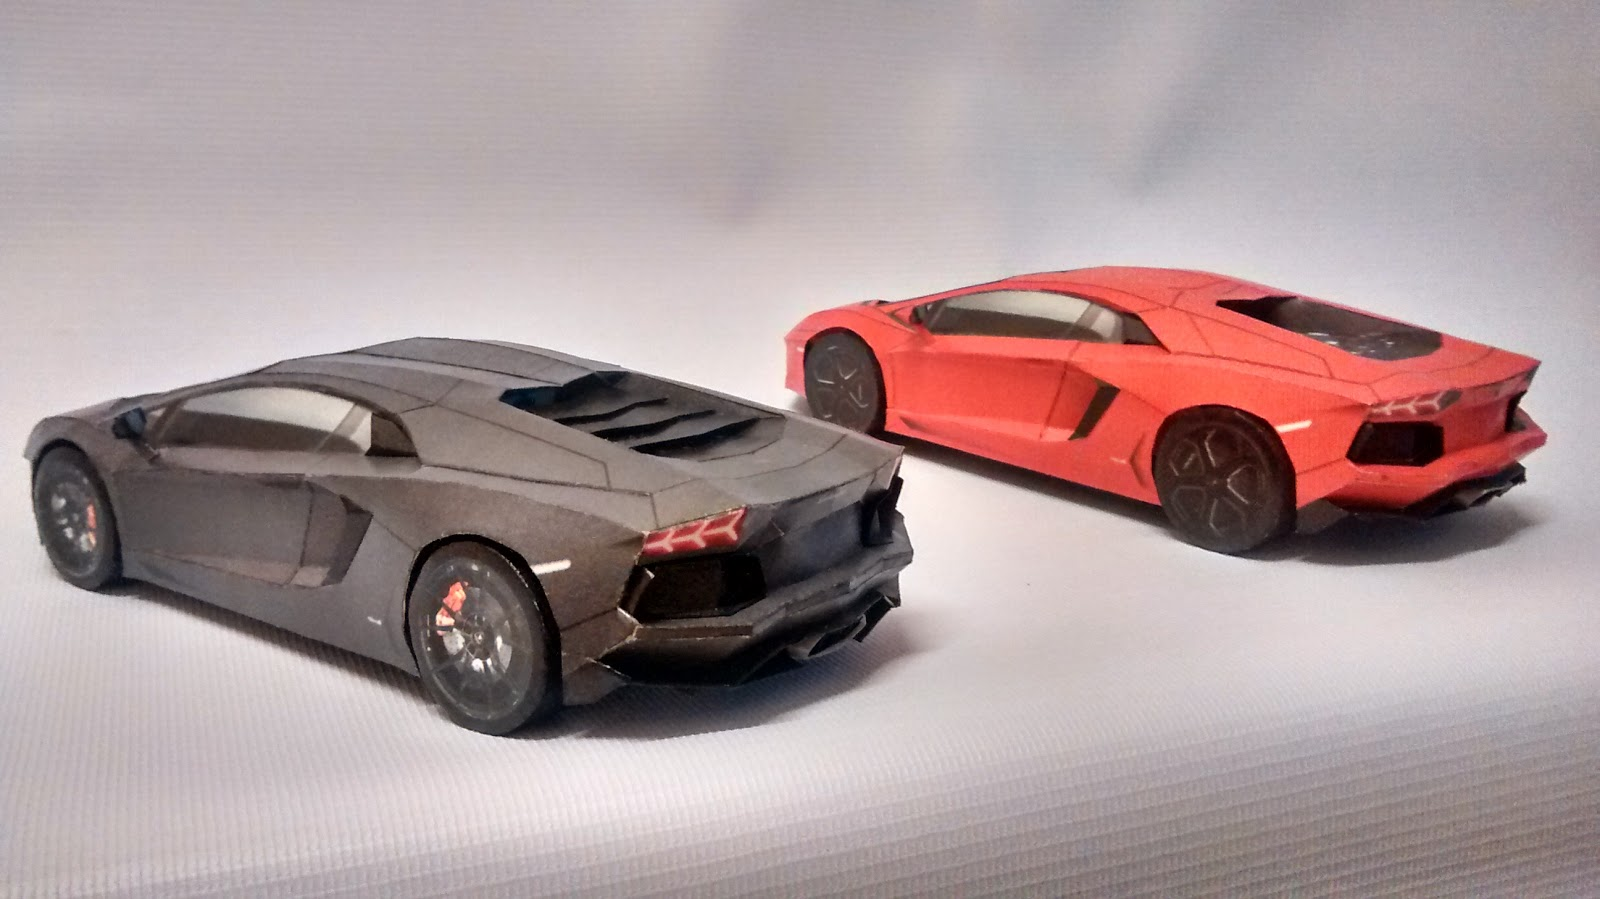 Best papercraft car art template aventador inspired 3d paper models papercraft for Lamborghini template